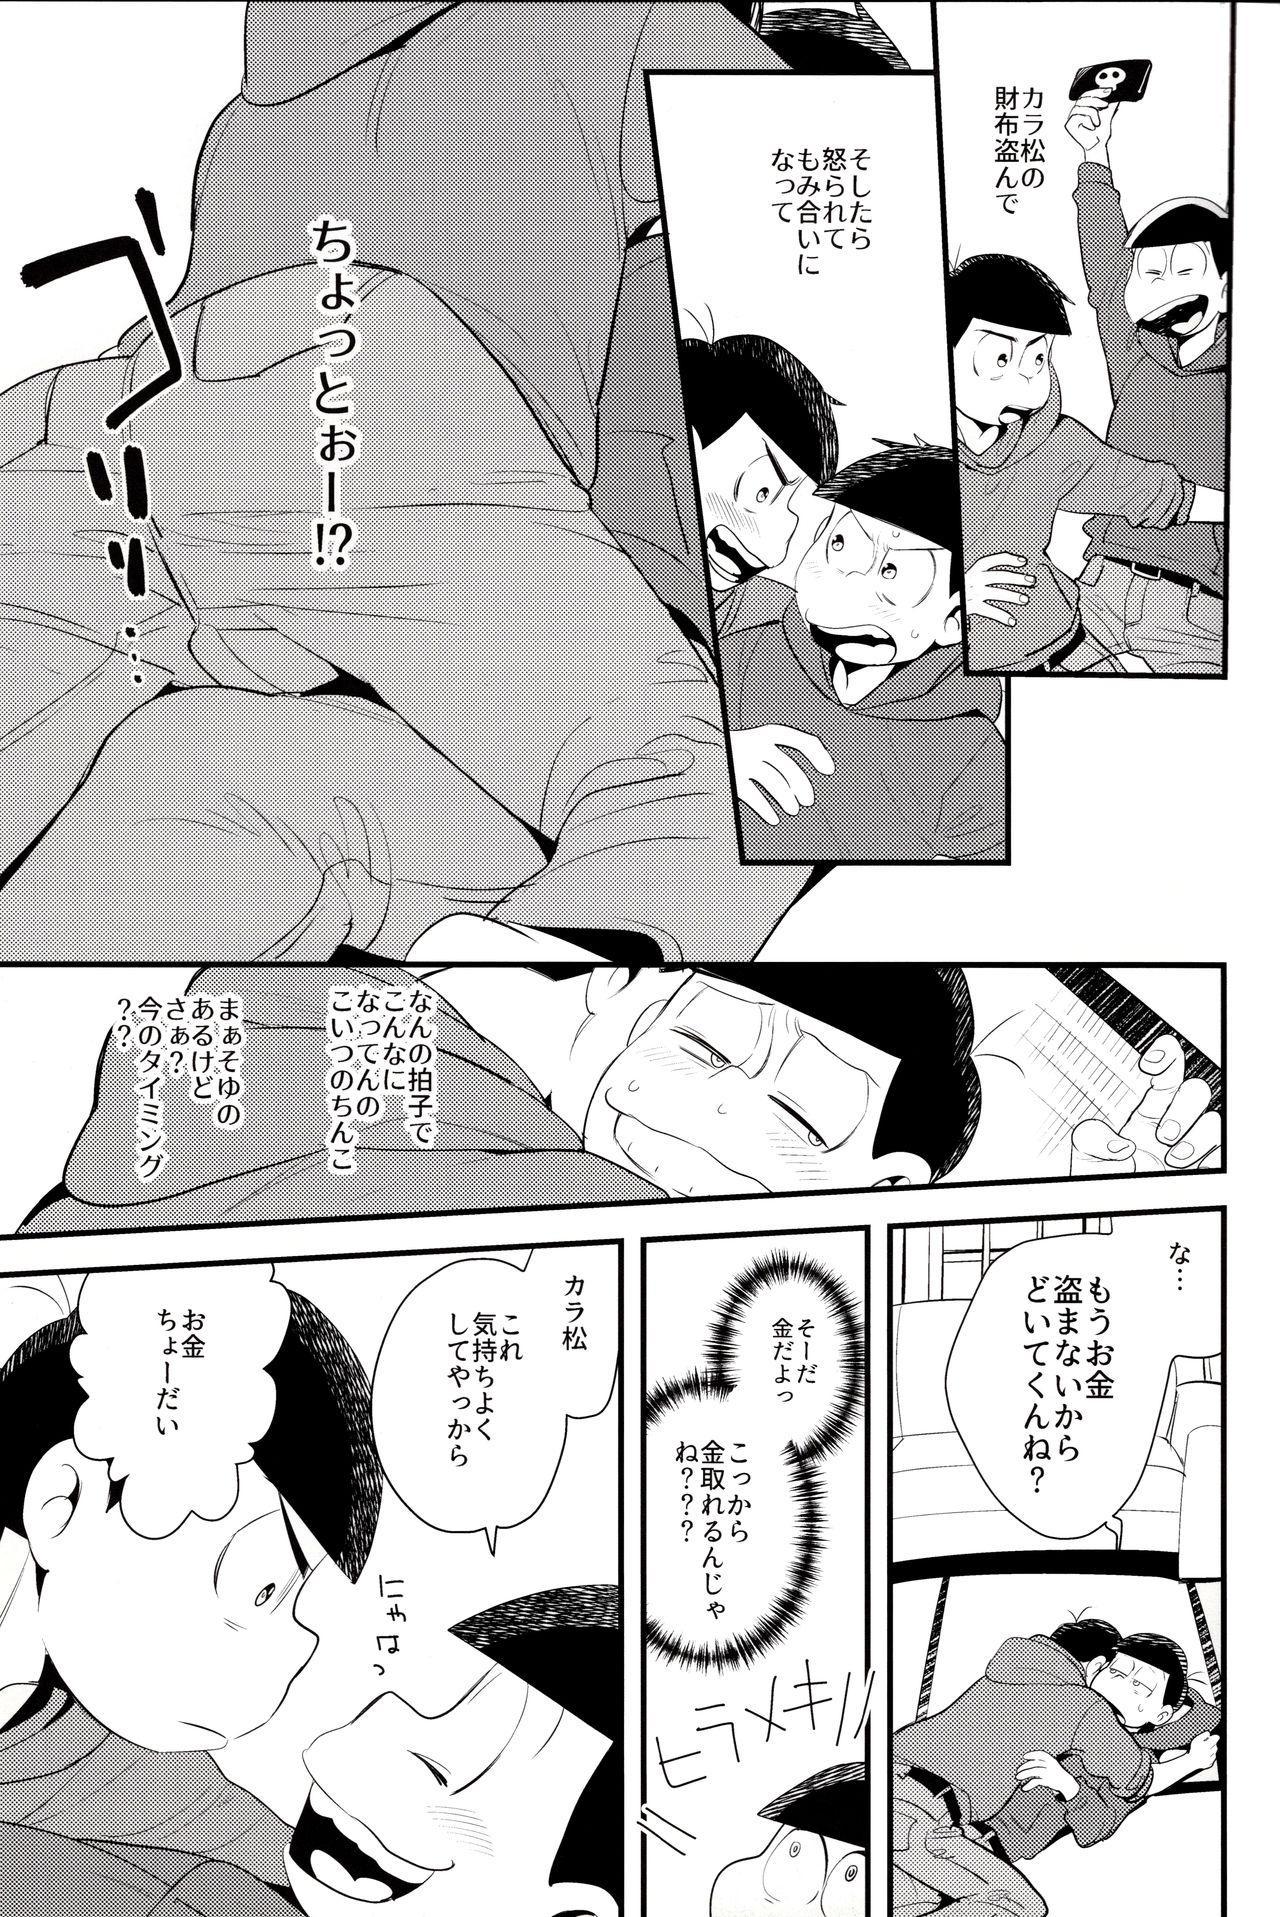 Onii-chan wa Uritai!! 2